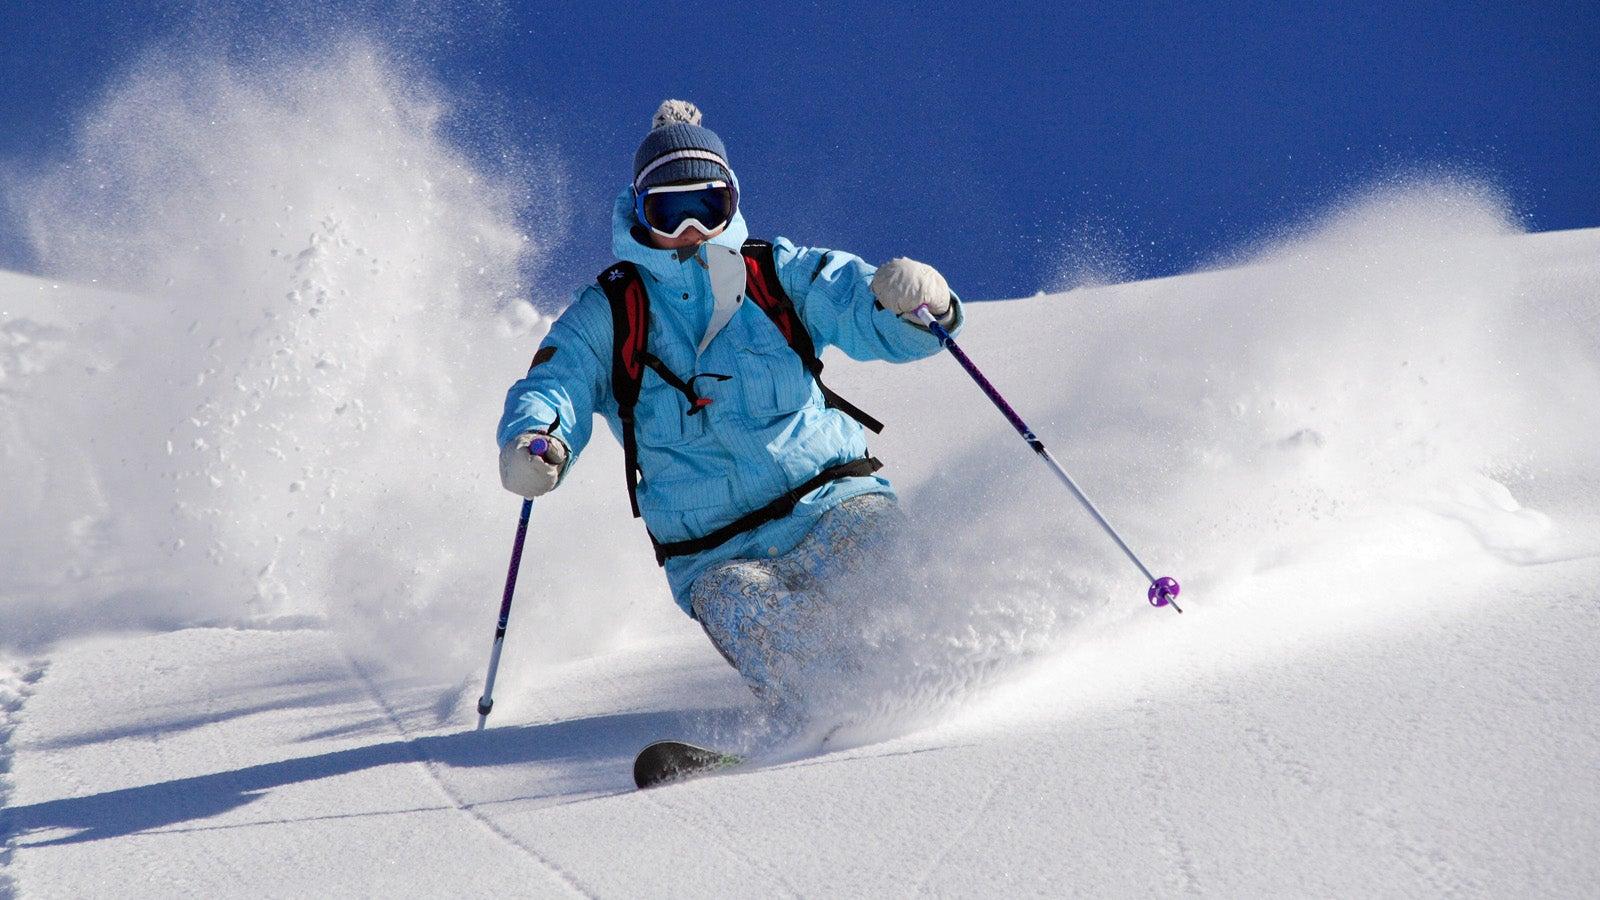 Ratschings: Kleines, aber feines Skiparadies hinter dem Brenner